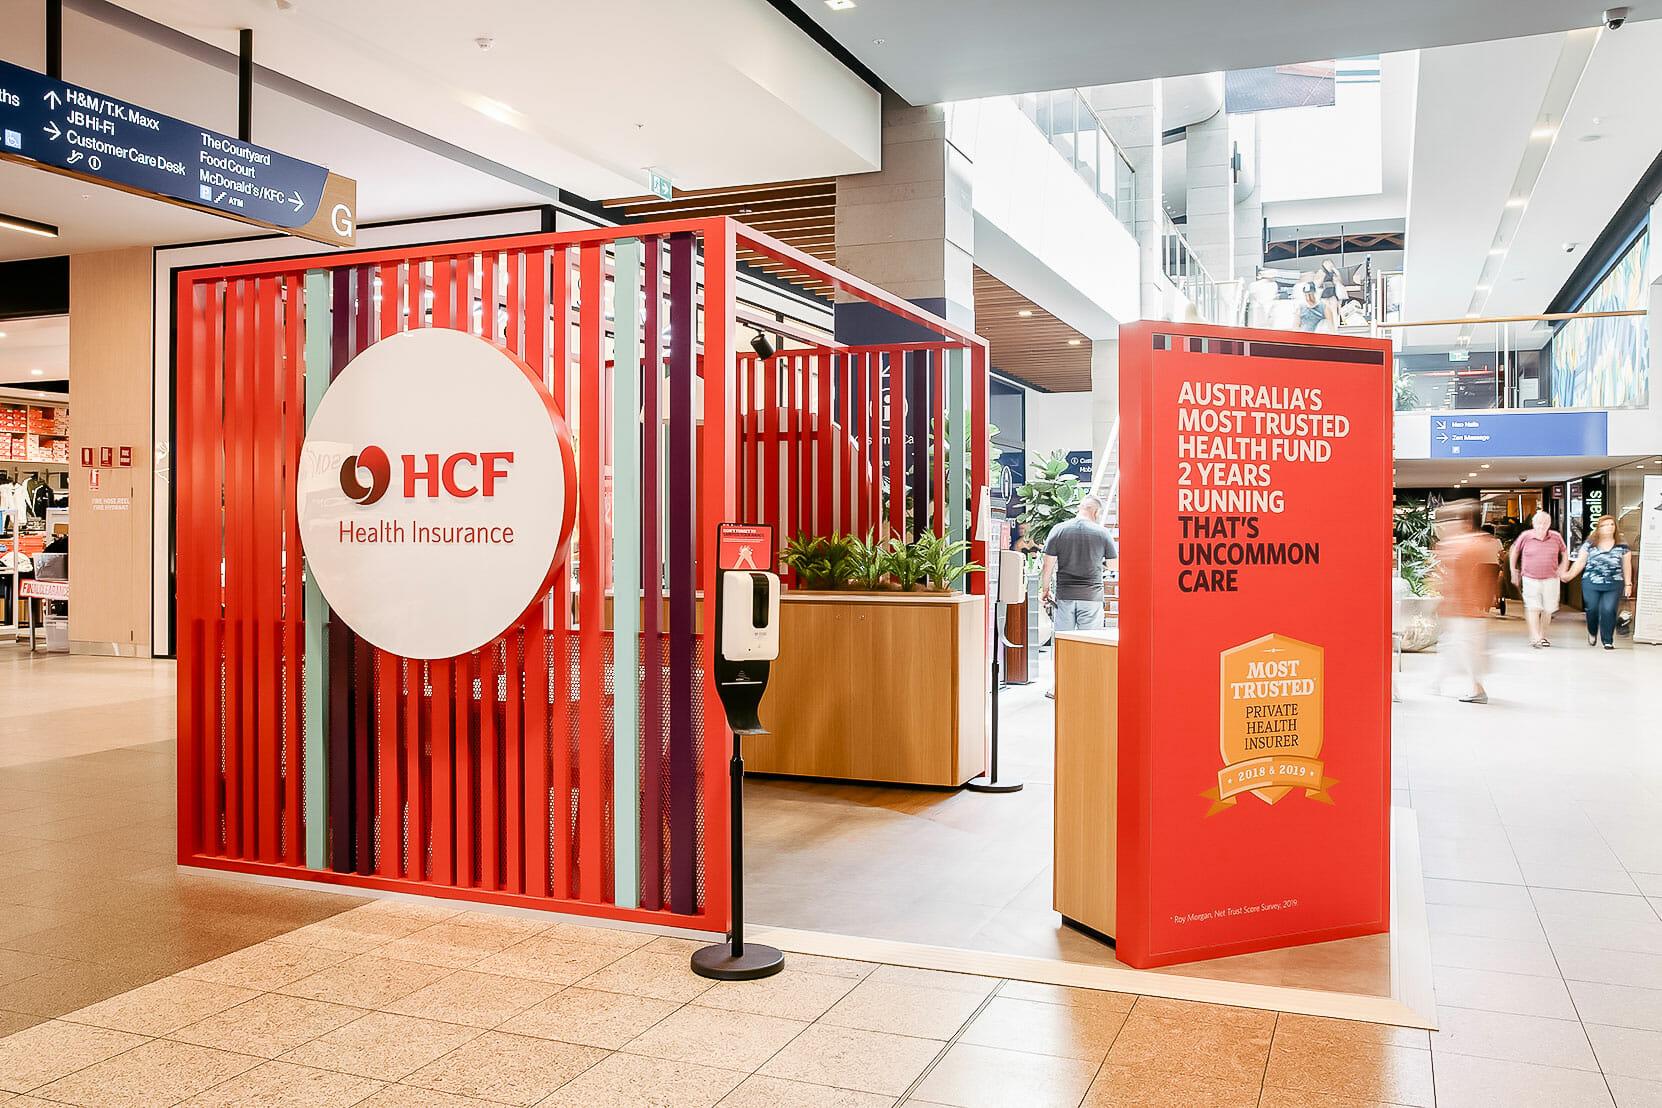 HCF Kiosk